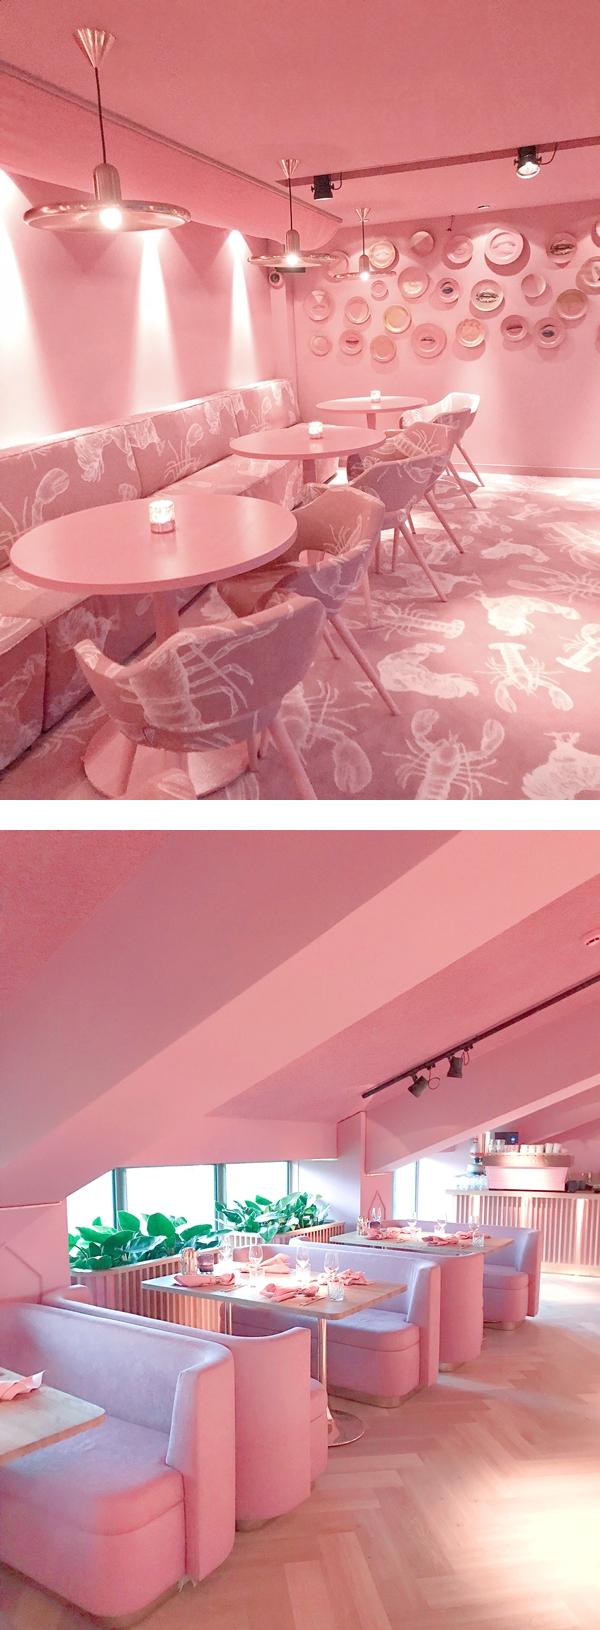 mamakelly荷蘭粉紅色餐廳 (10).jpg